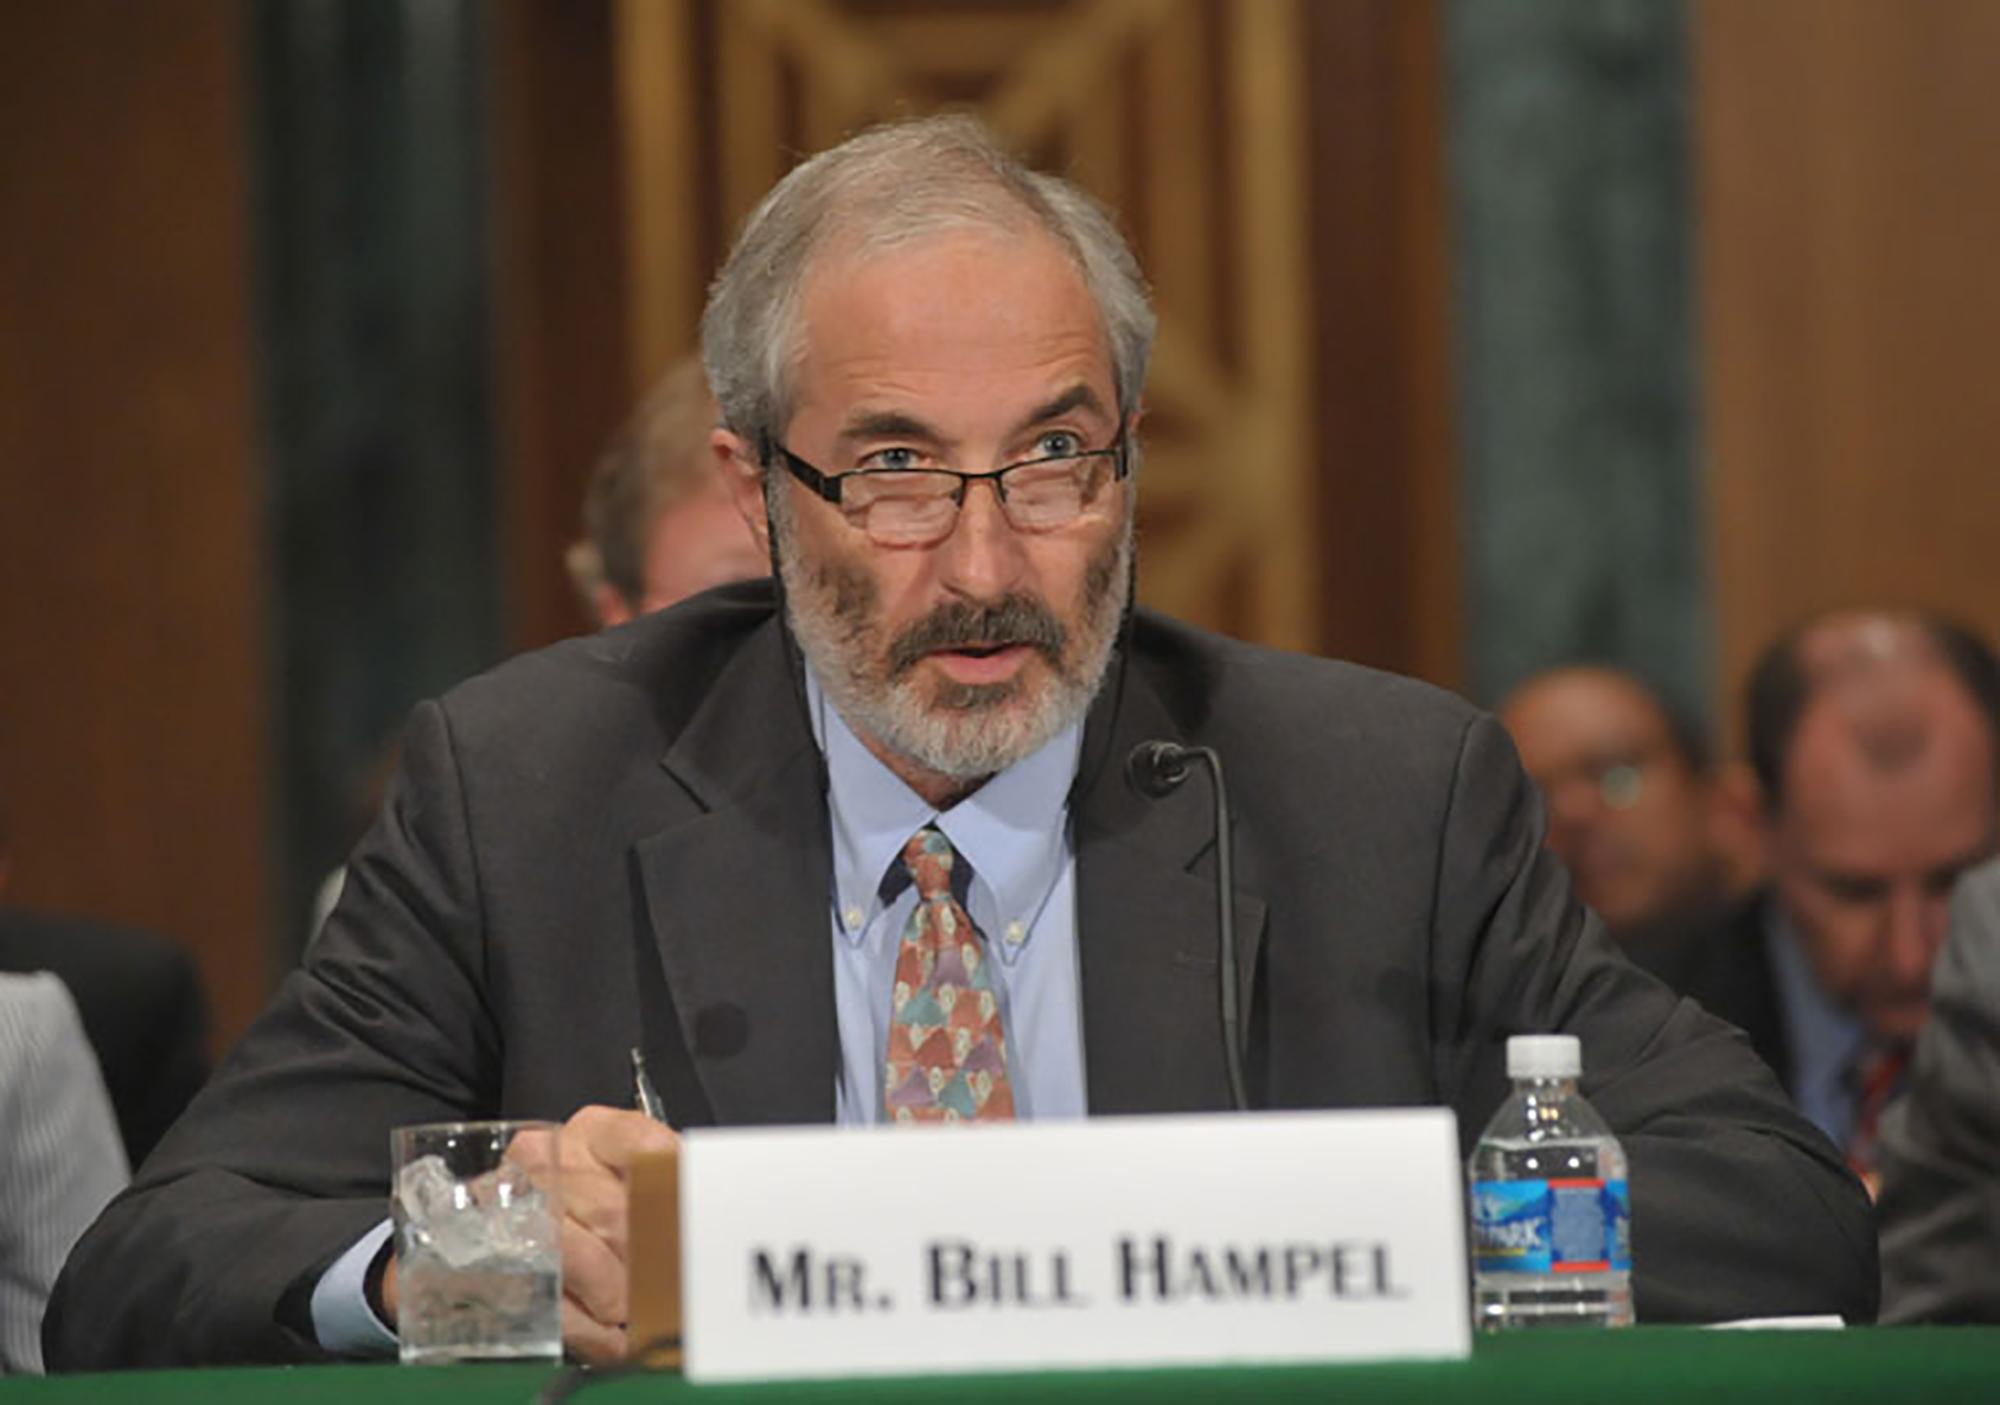 Bill Hampel (Image: CUNA.org)